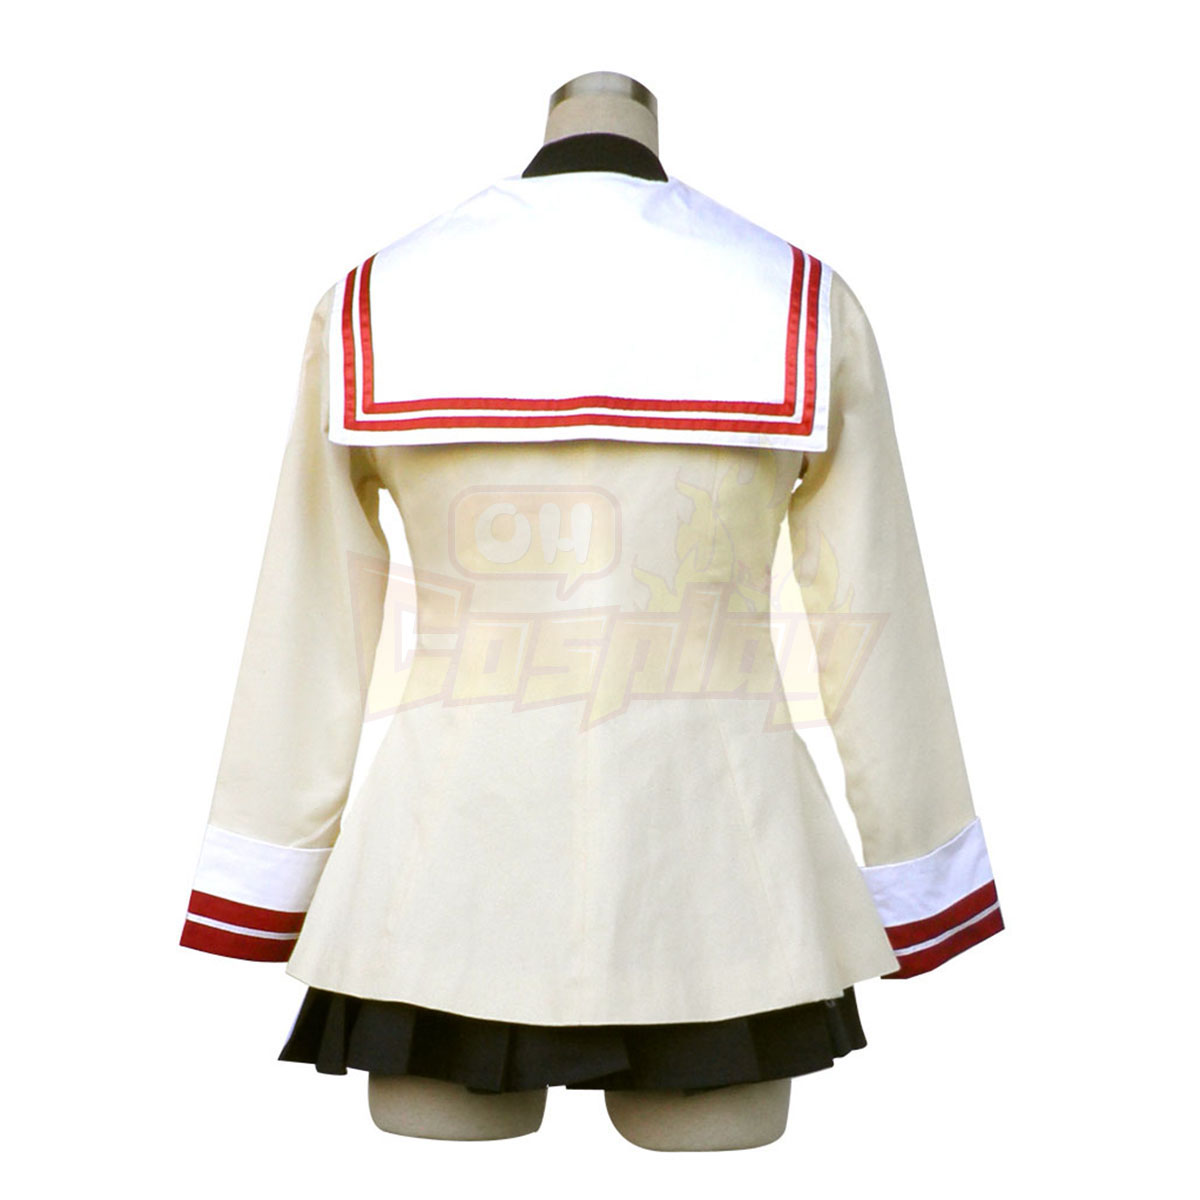 De lujo Disfraces de Clannad Ibuki Fūko 1ST High School Female Uniforme de Invierno Green Badge